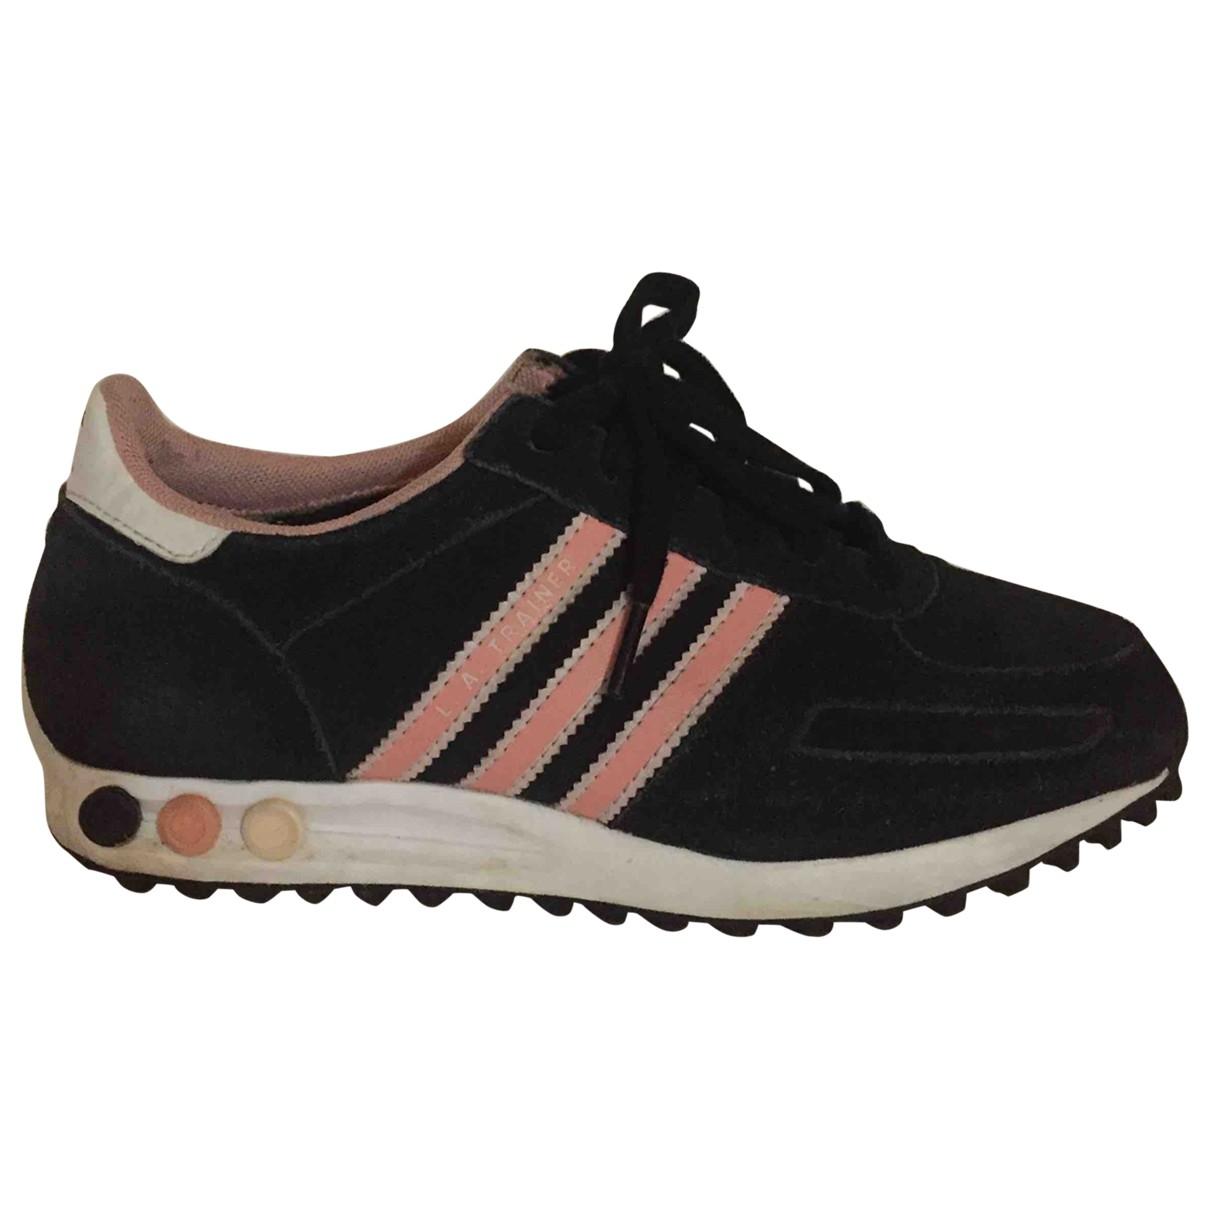 Adidas \N Black Suede Trainers for Women 37.5 EU